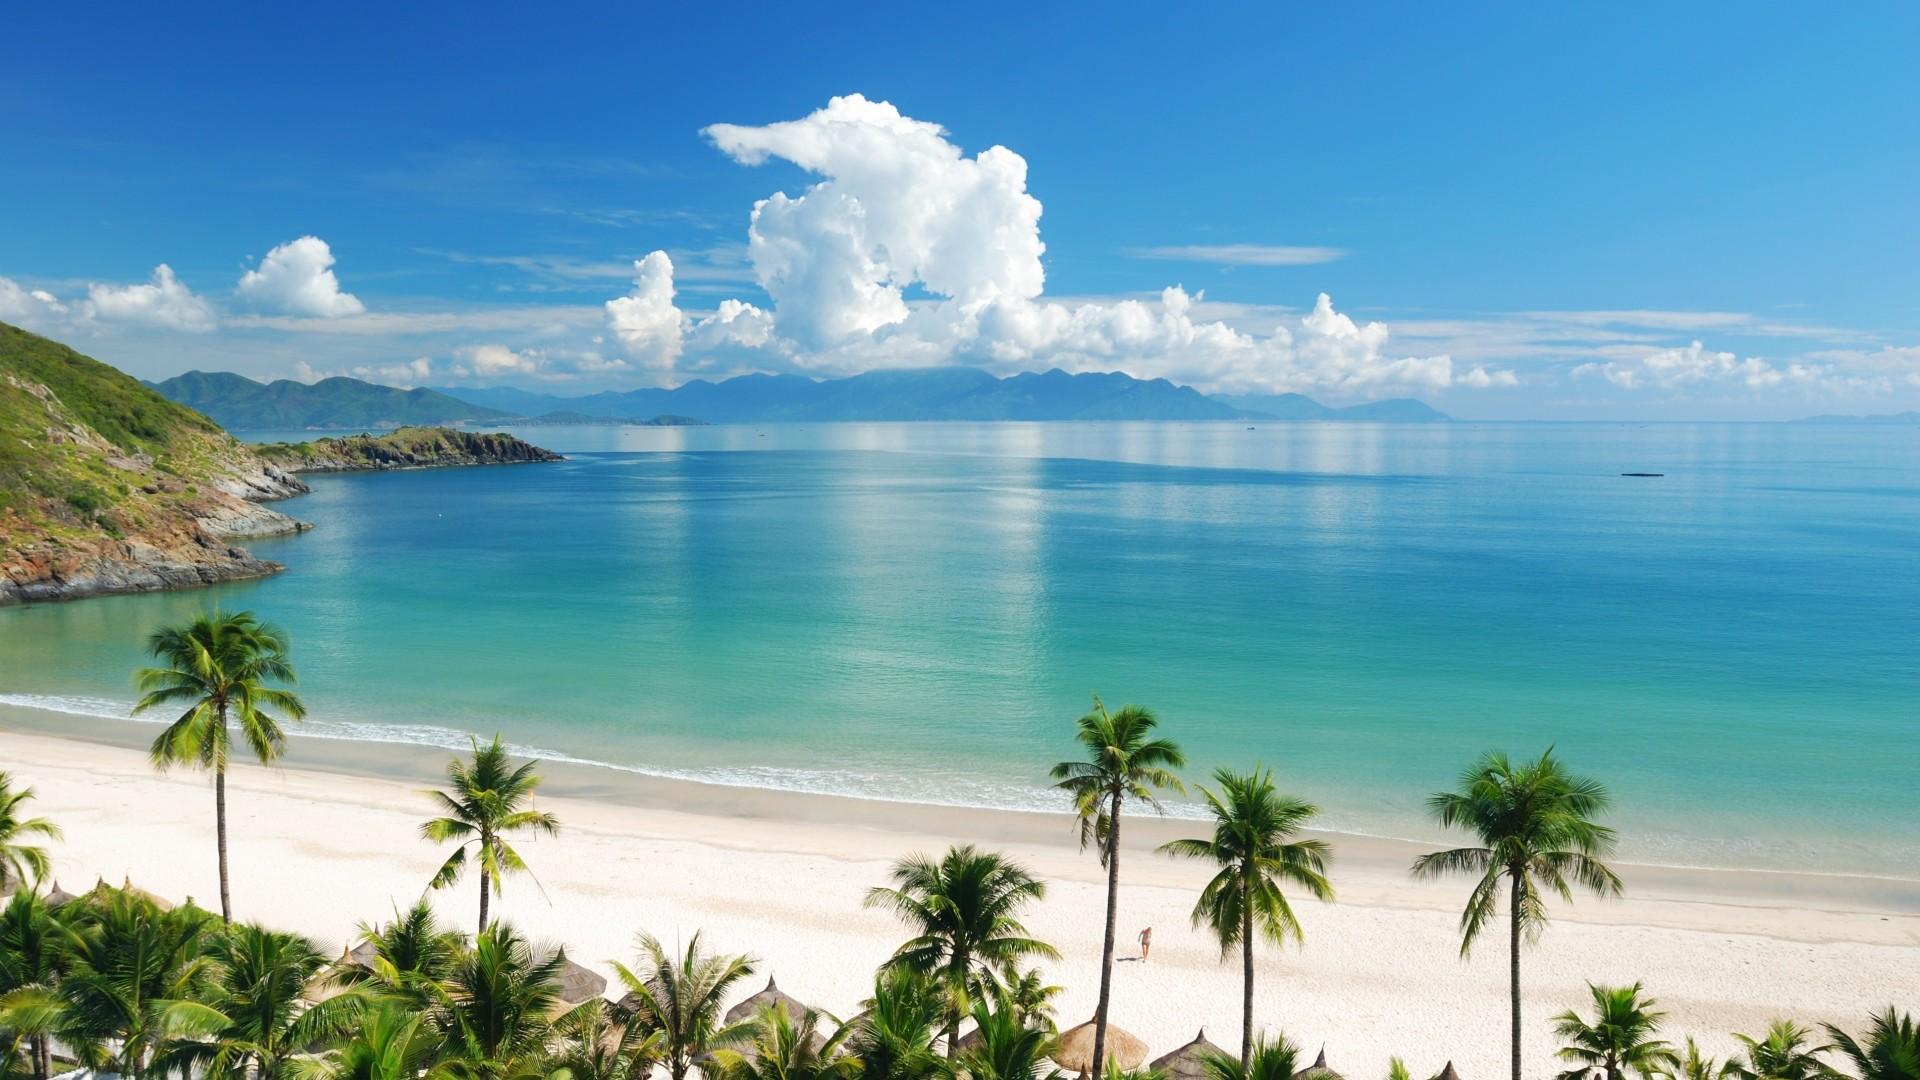 … Background Full HD 1080p. Wallpaper beach, tropics, sea,  sand, summer